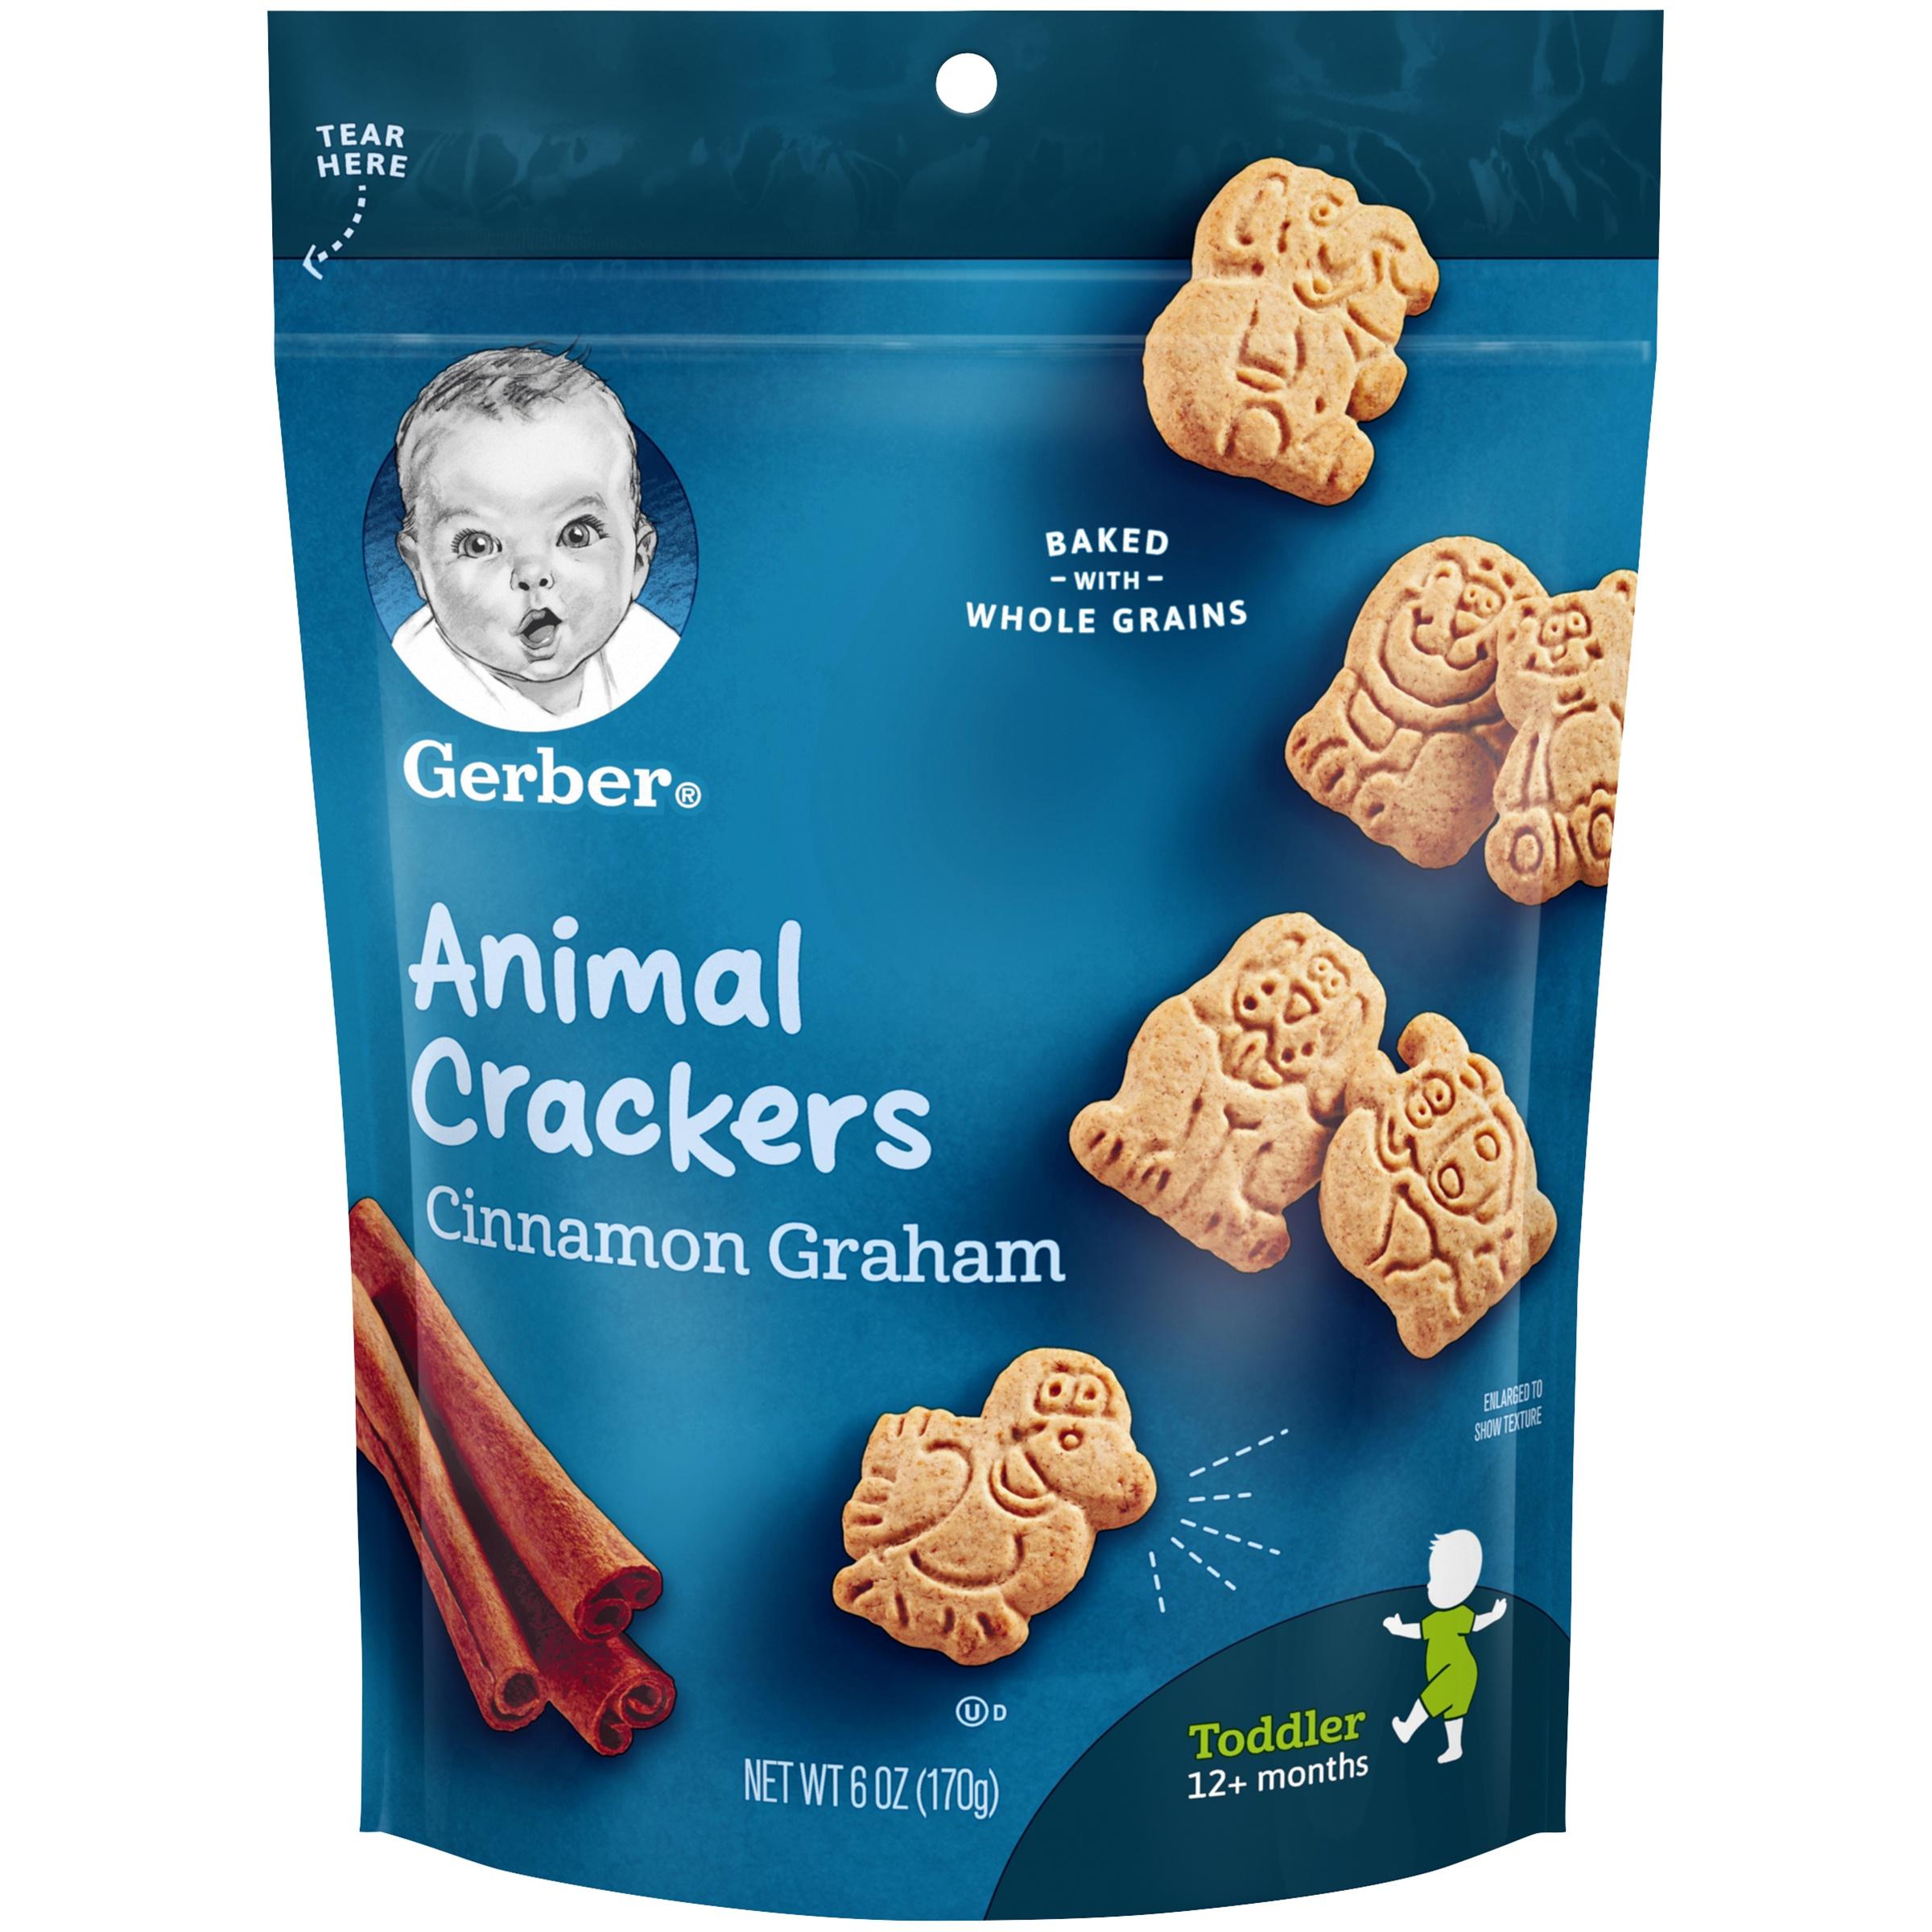 Gerber Cinnamon Graham Animal Crackers, 6 oz.